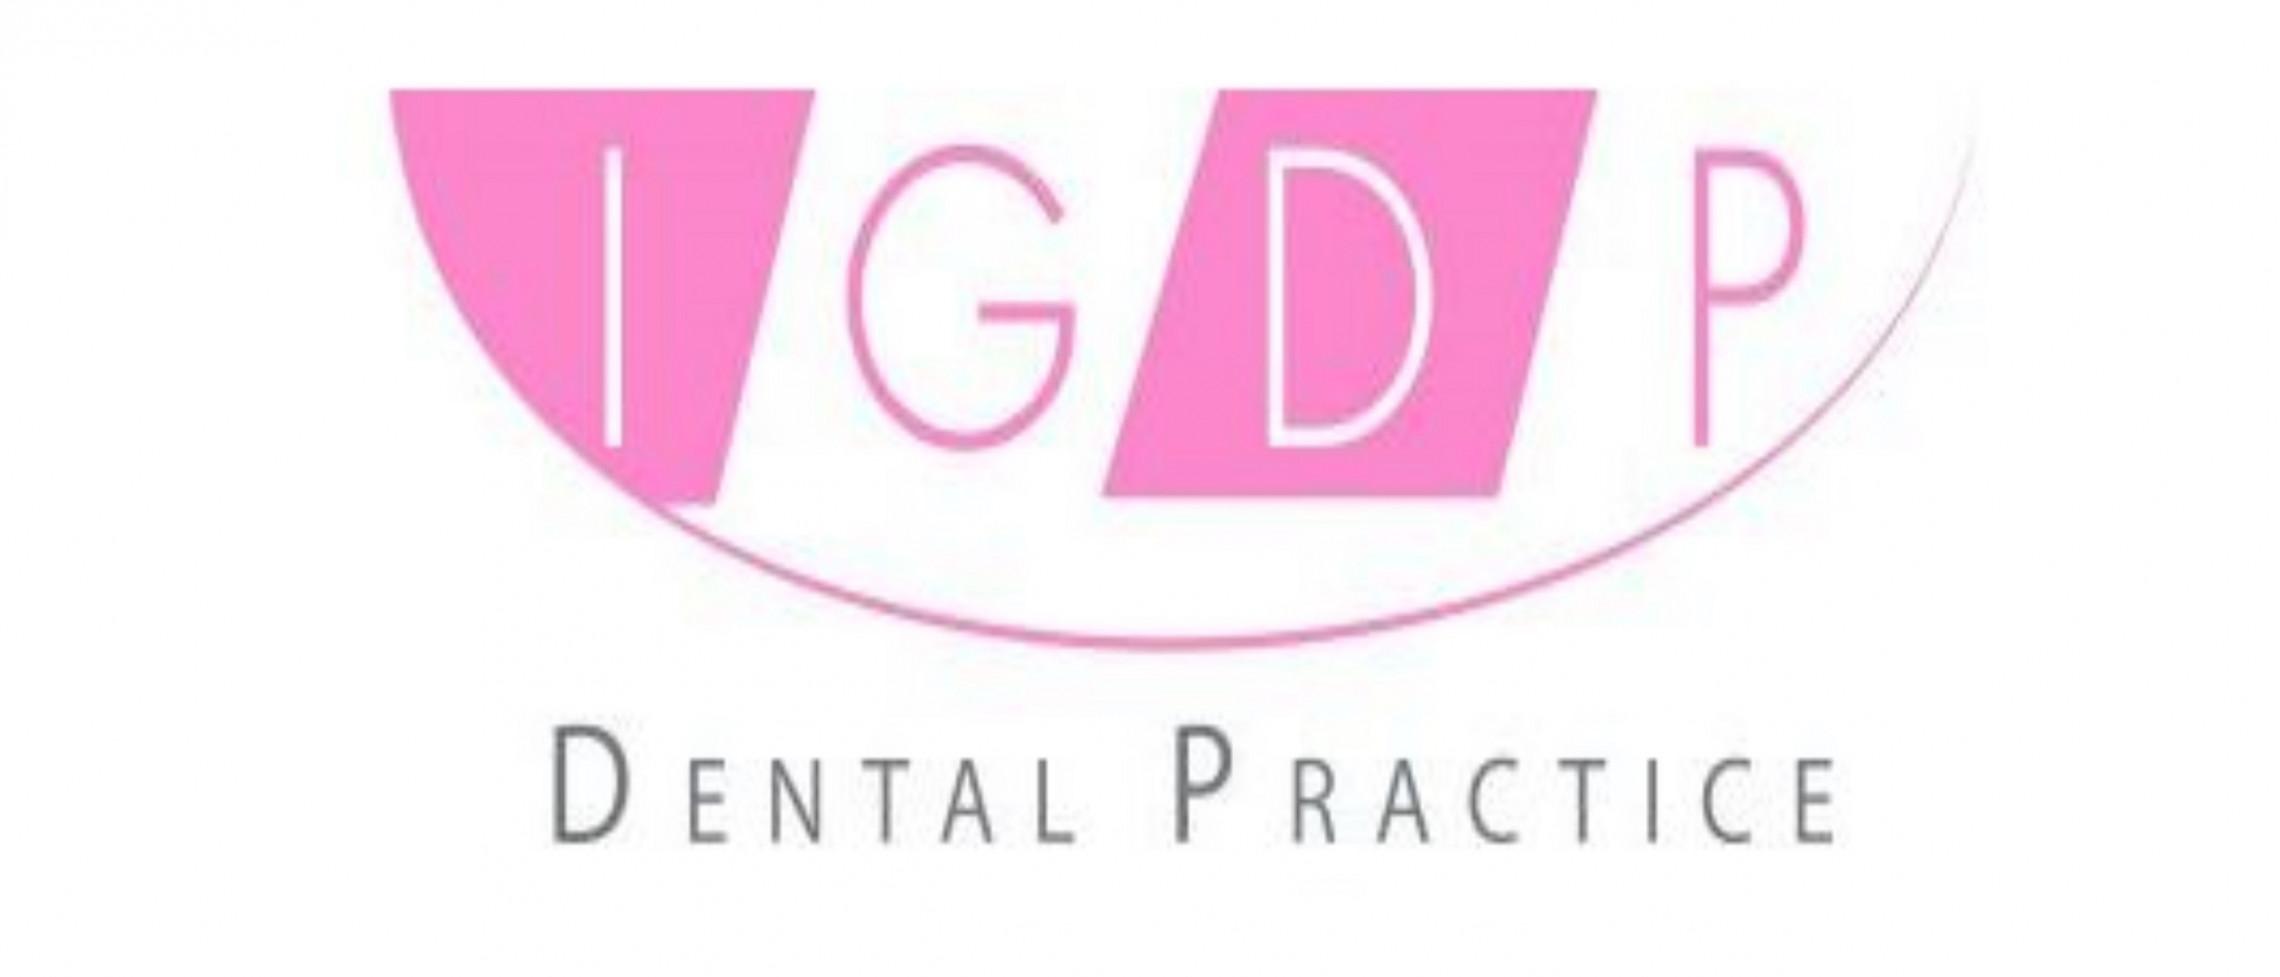 Islington Green Dental Practice